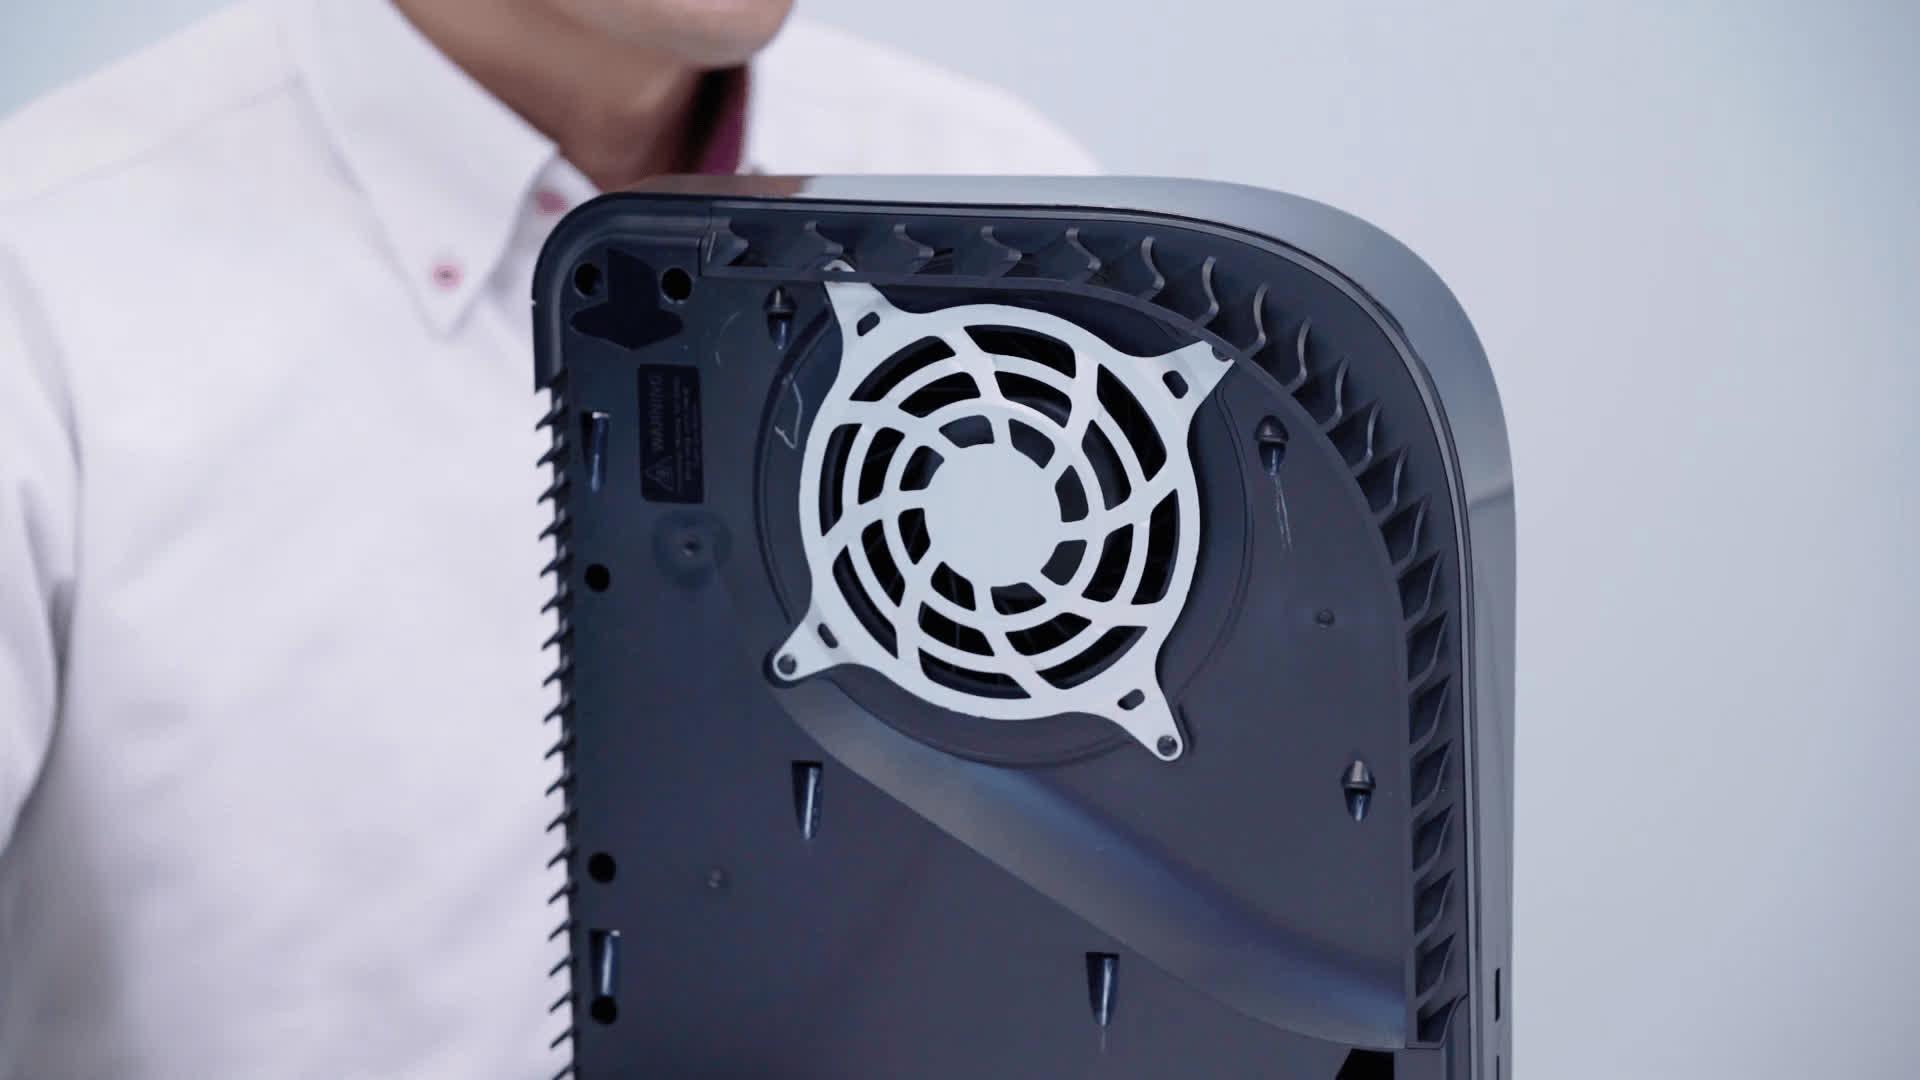 PS5 Will Adjust Fan Speed Through System Updates